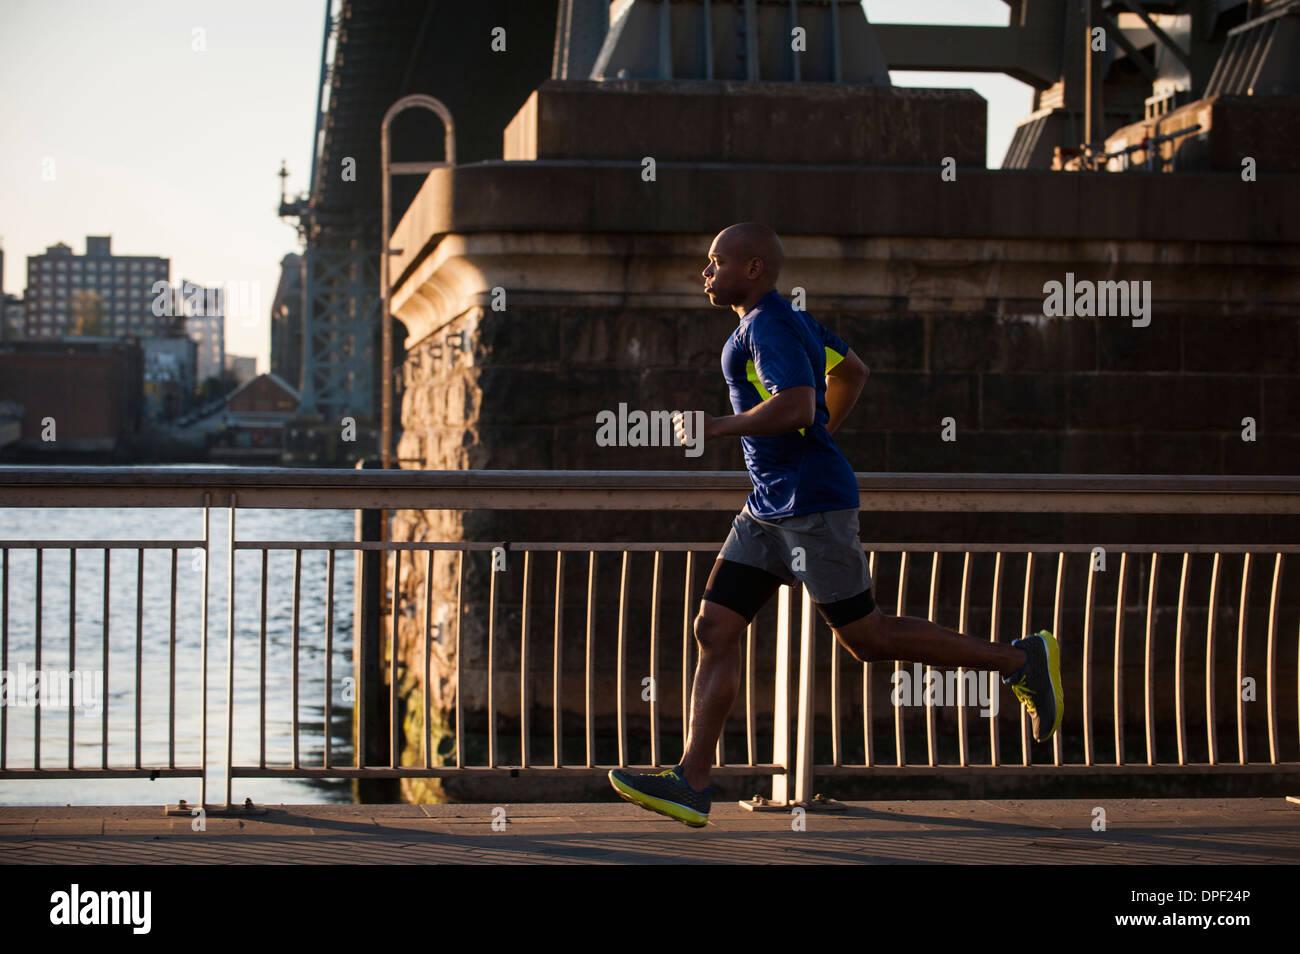 Uomo di jogging sul marciapiede Immagini Stock